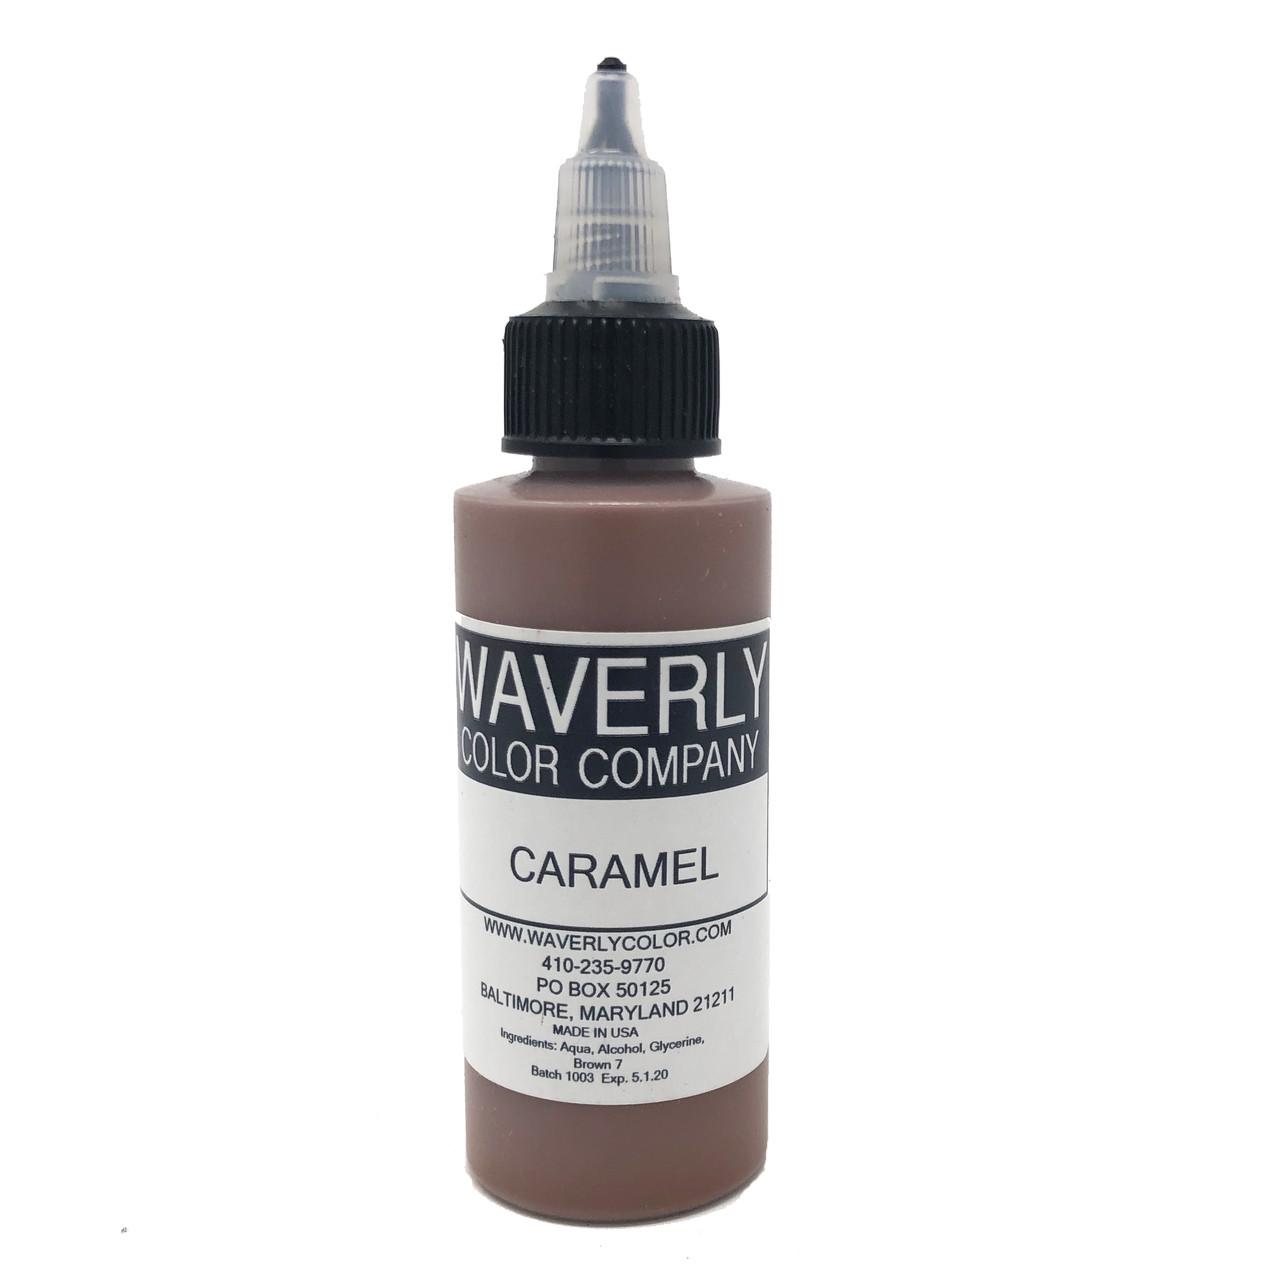 Waverly Caramel - Good Guy Tattoo Supply